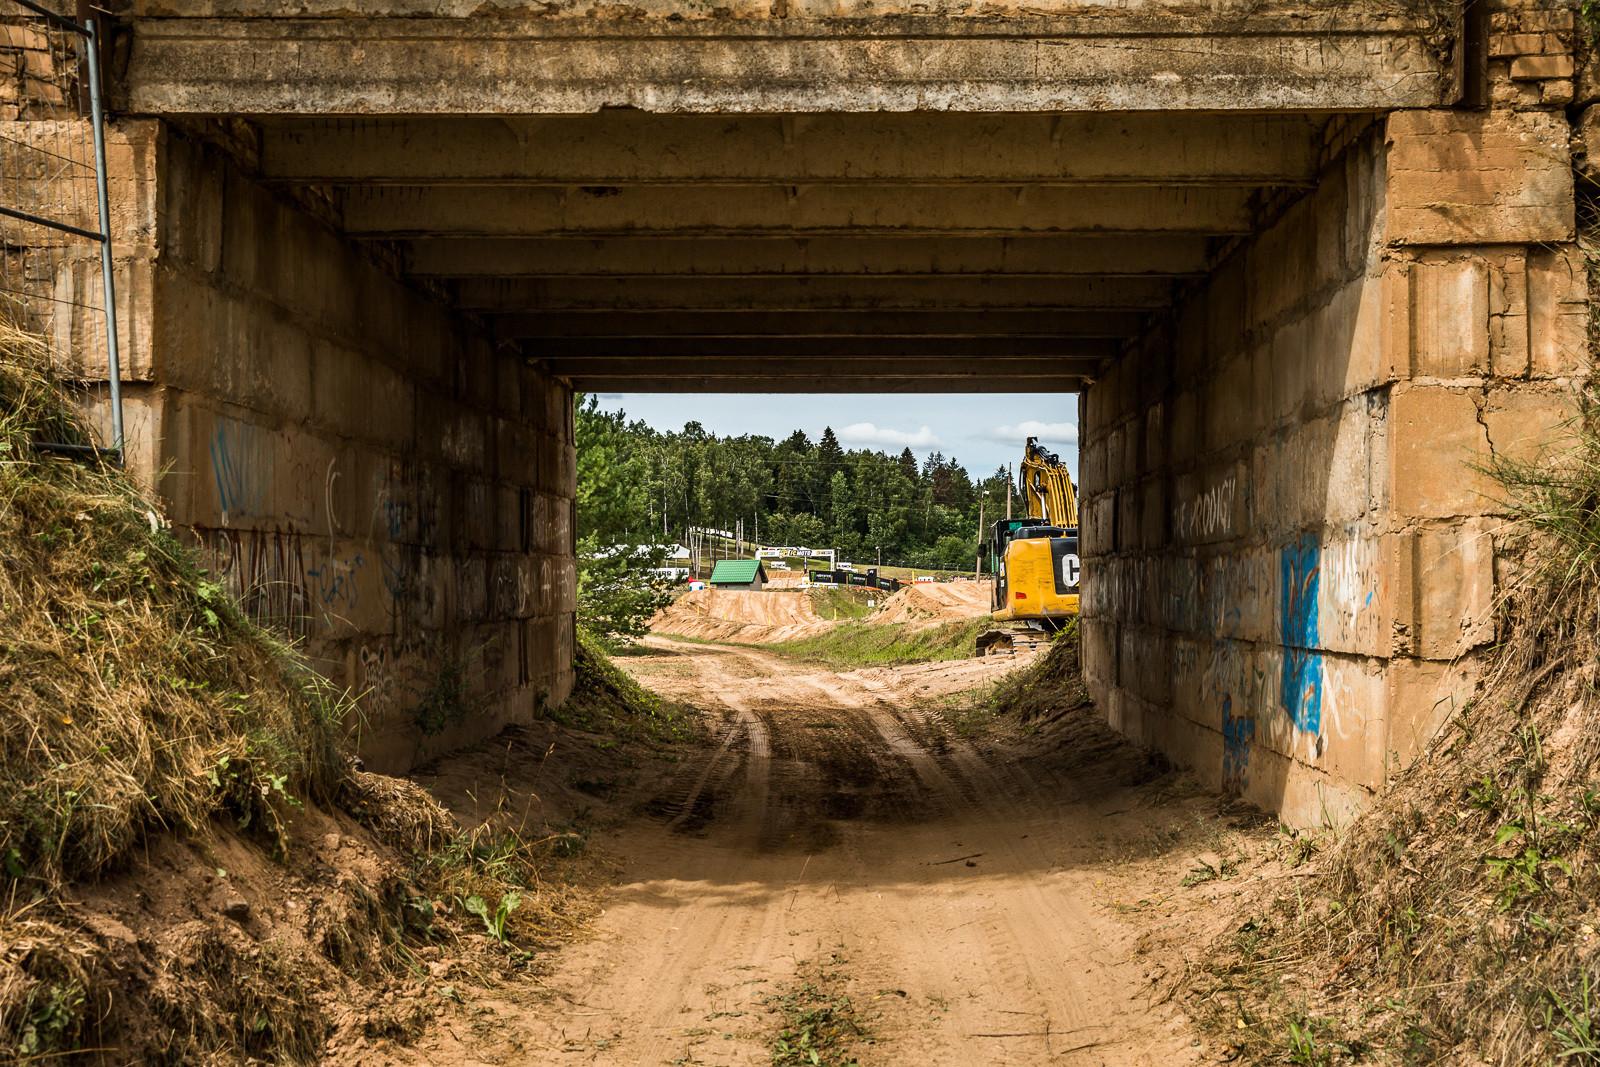 That's one heavy-duty tunnel.